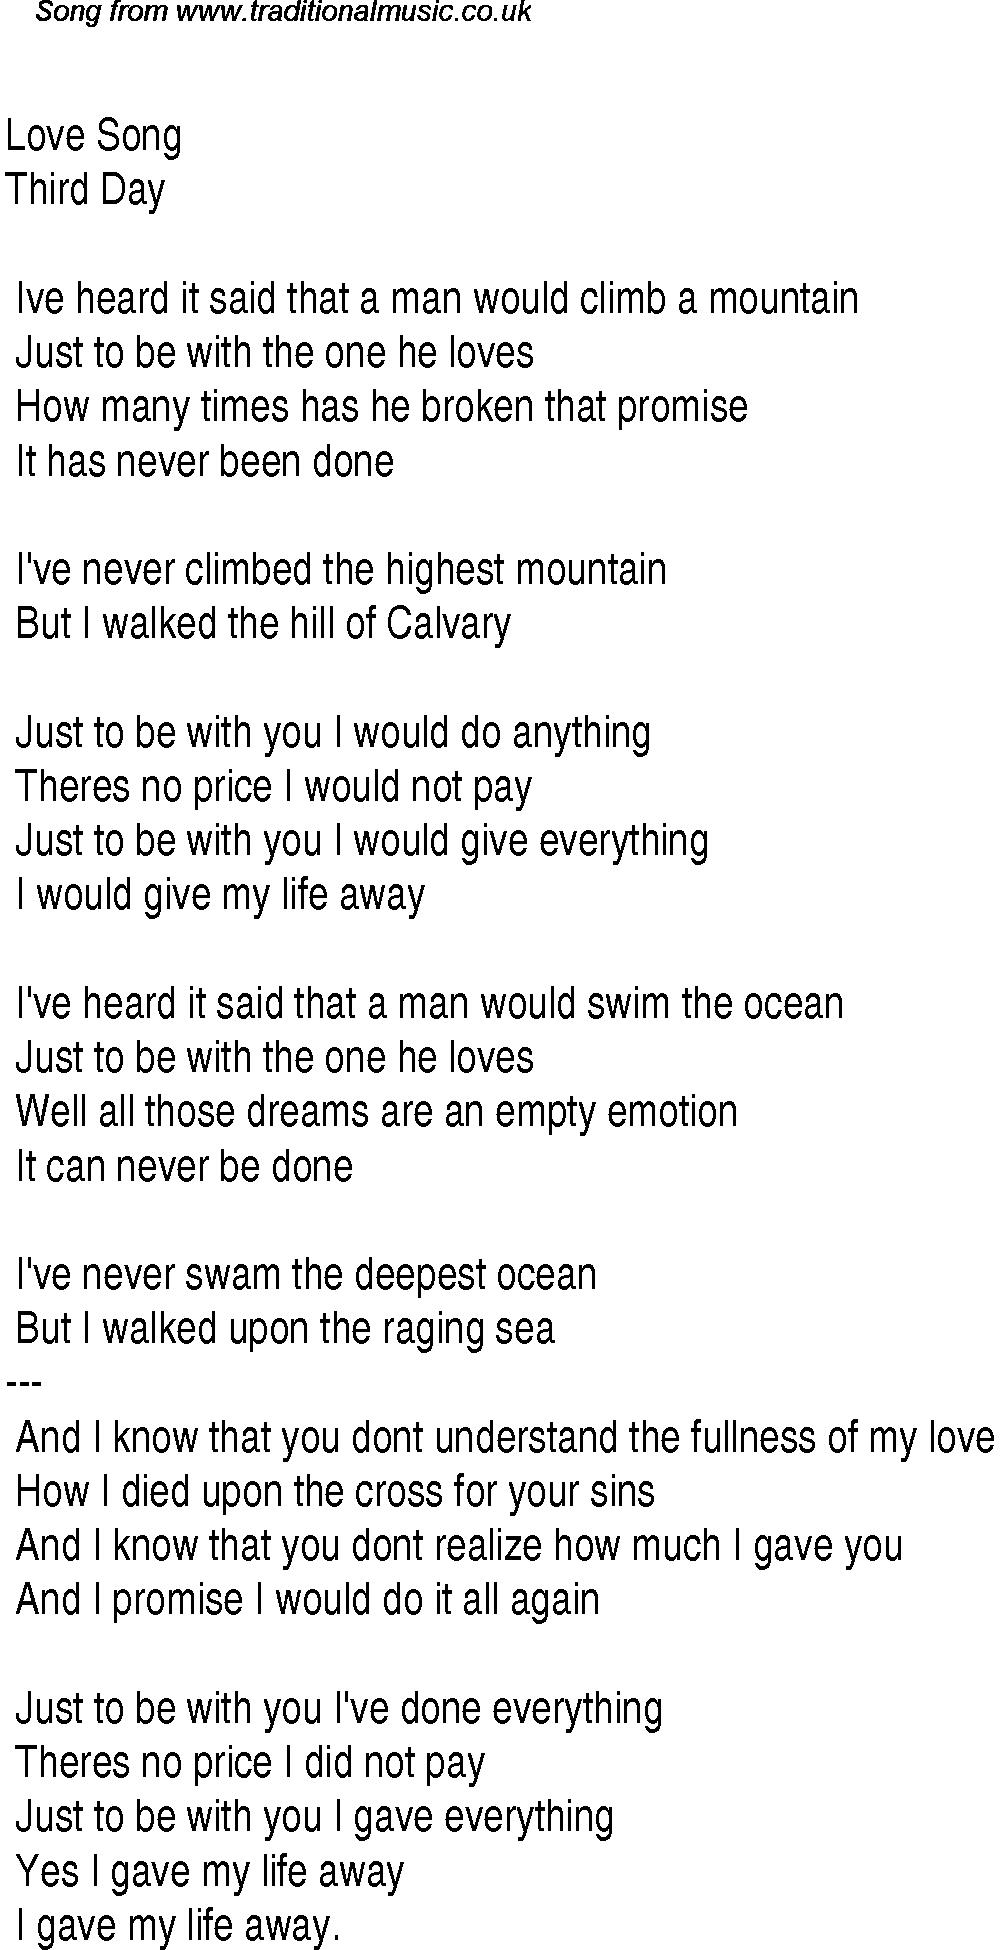 Christian Songs | Christian Worship Song Lyrics: Love Song | Music - Free Printable Lyrics To Christian Songs